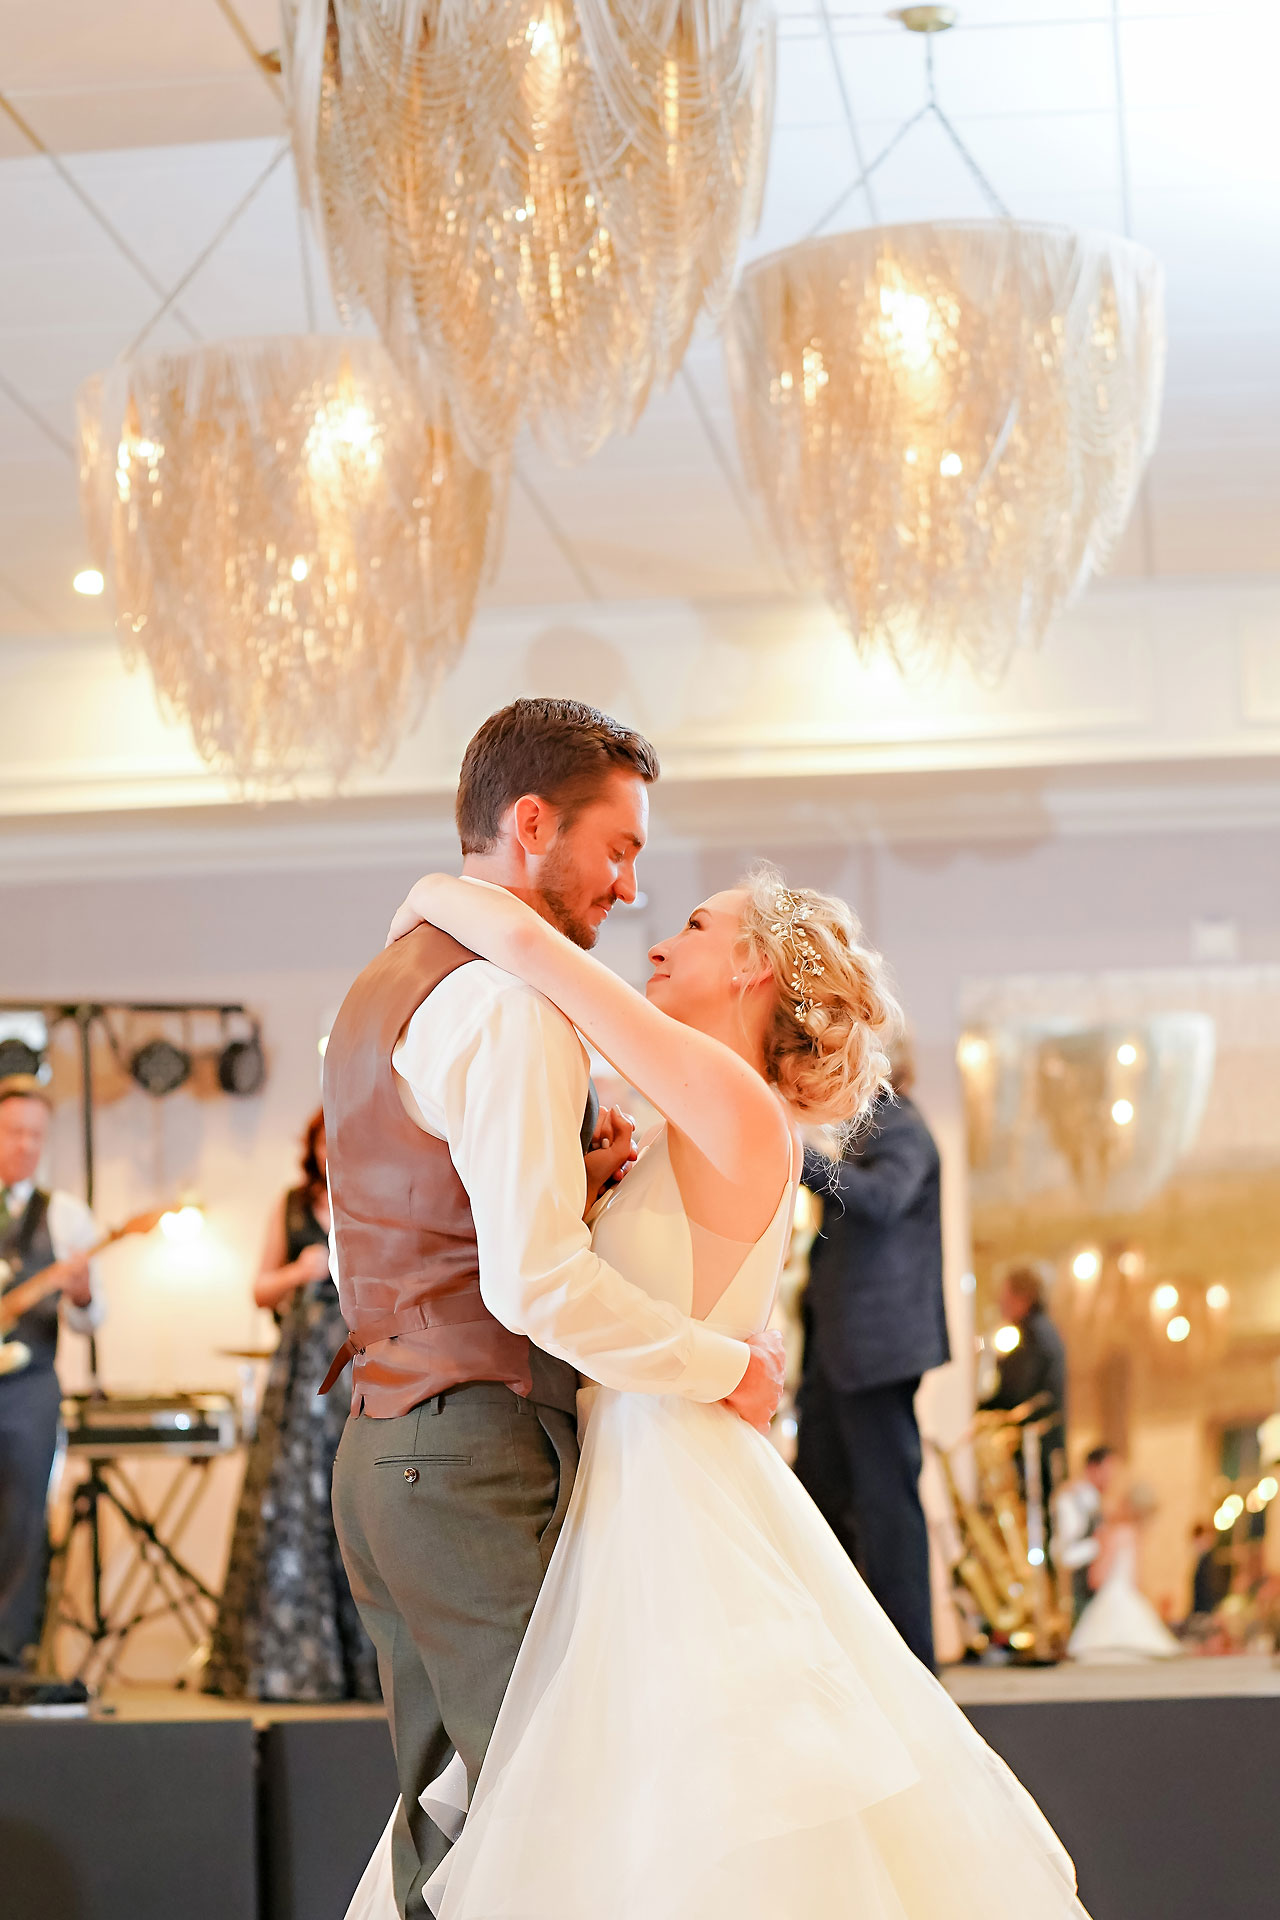 Brylie Jackson Ritz Charles Carmel Indiana Wedding Reception 159